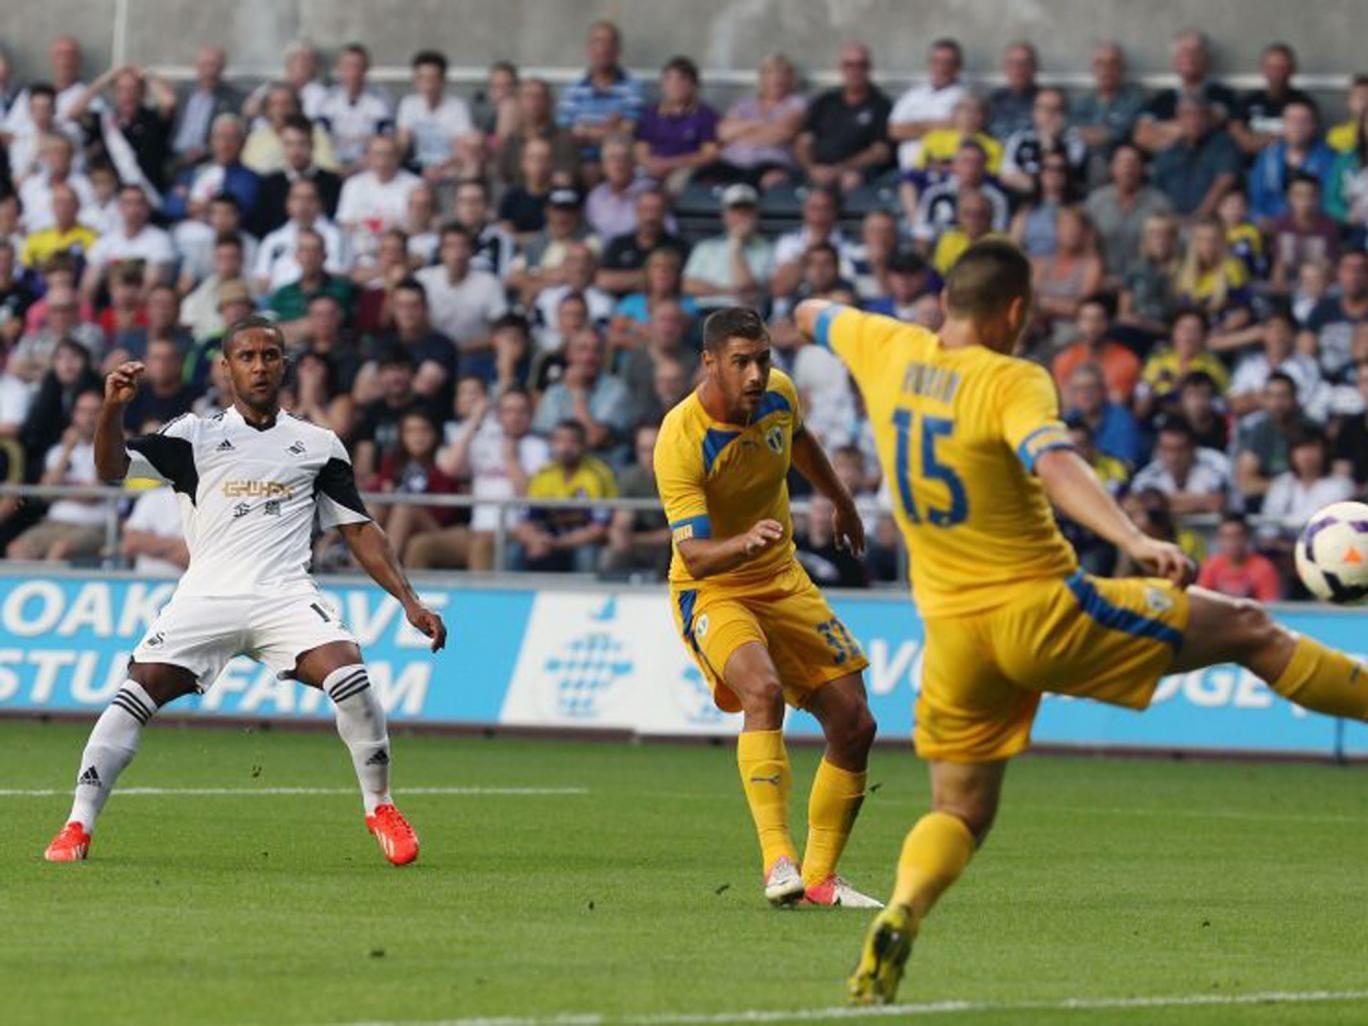 Wayne Routledge scored twice in Swansea's comprehensive win